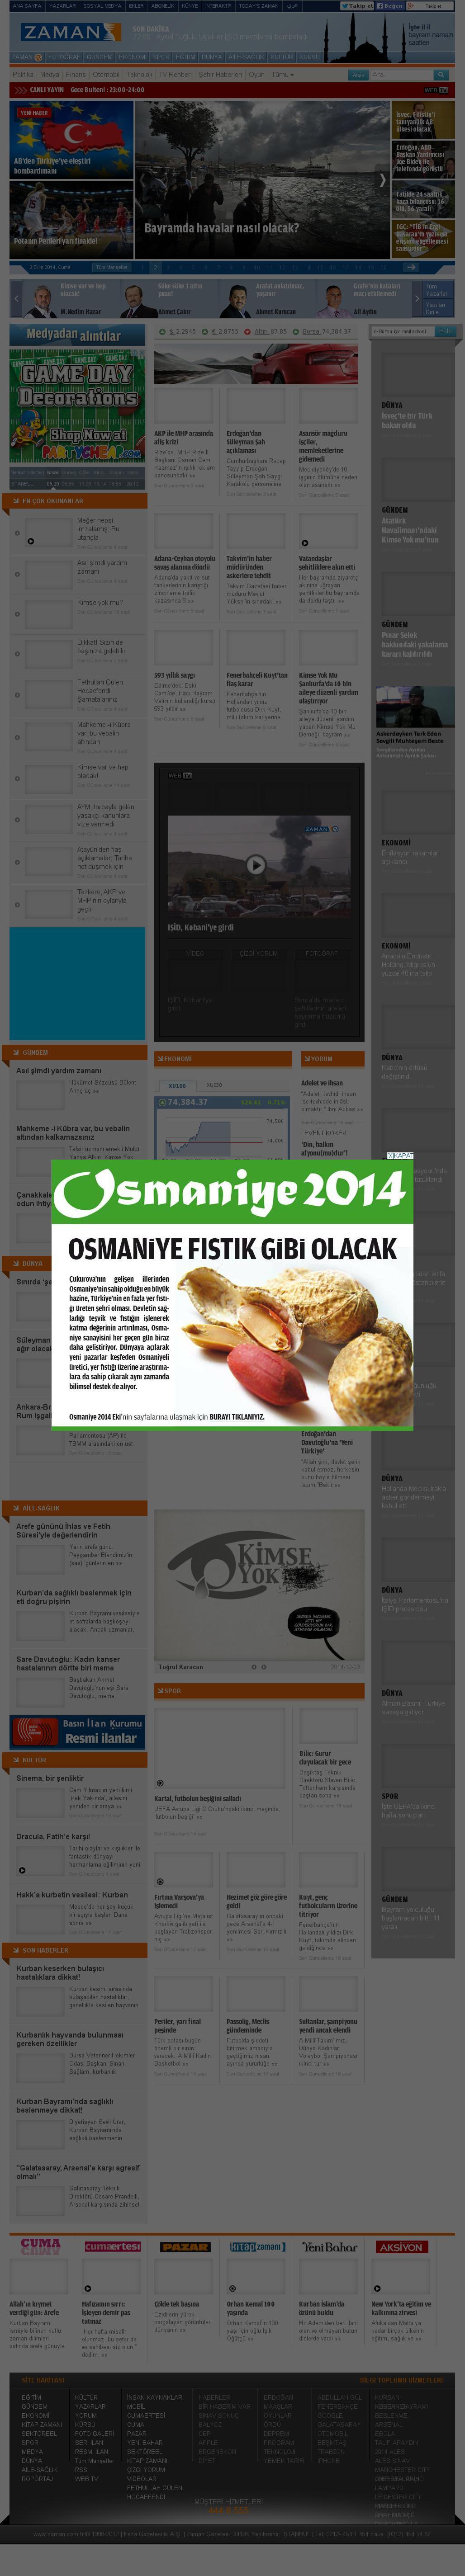 Zaman Online at Friday Oct. 3, 2014, 8:21 p.m. UTC